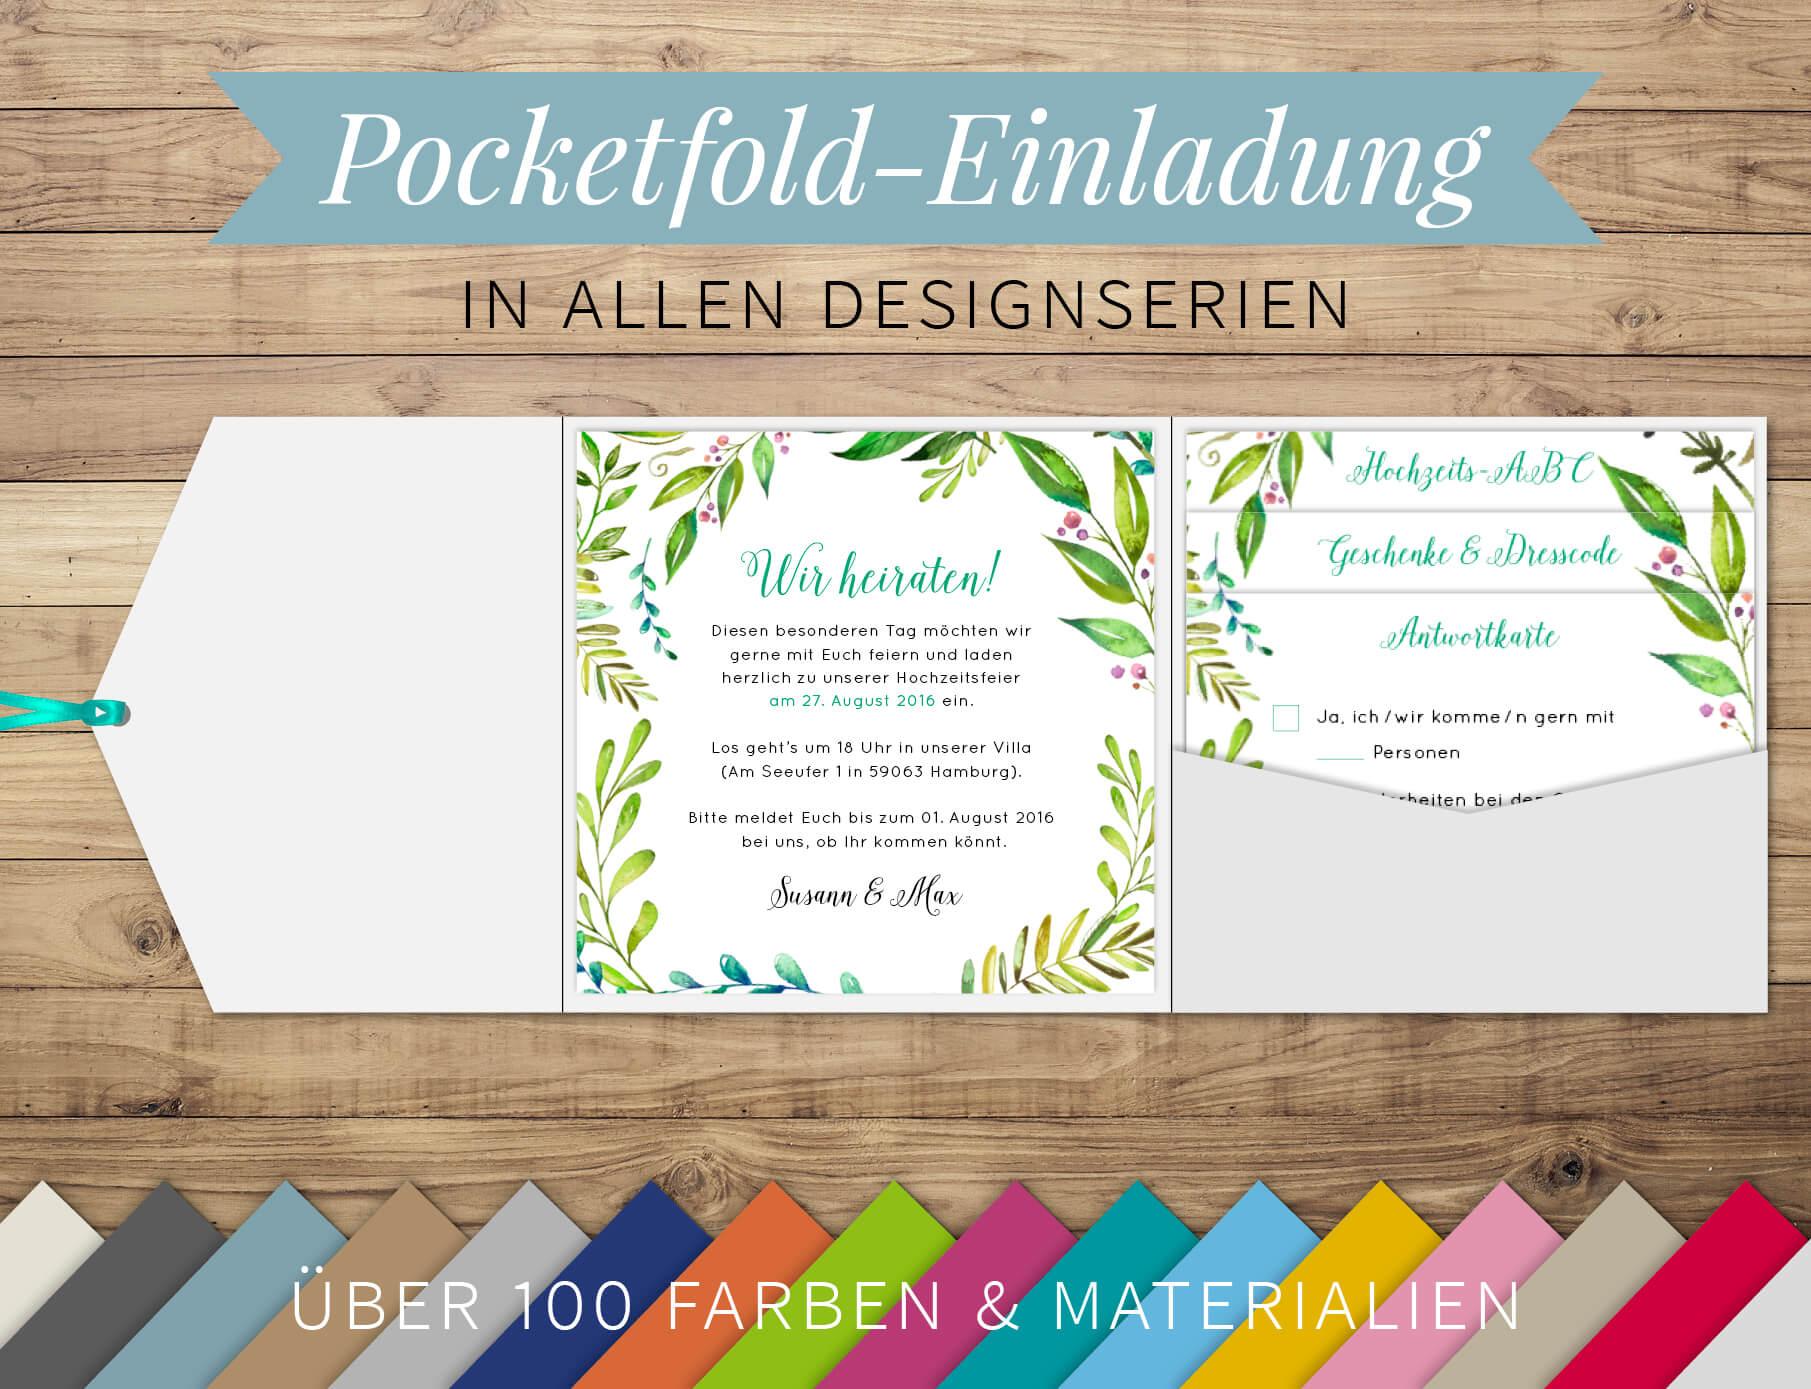 Unsere Pocketsfolds